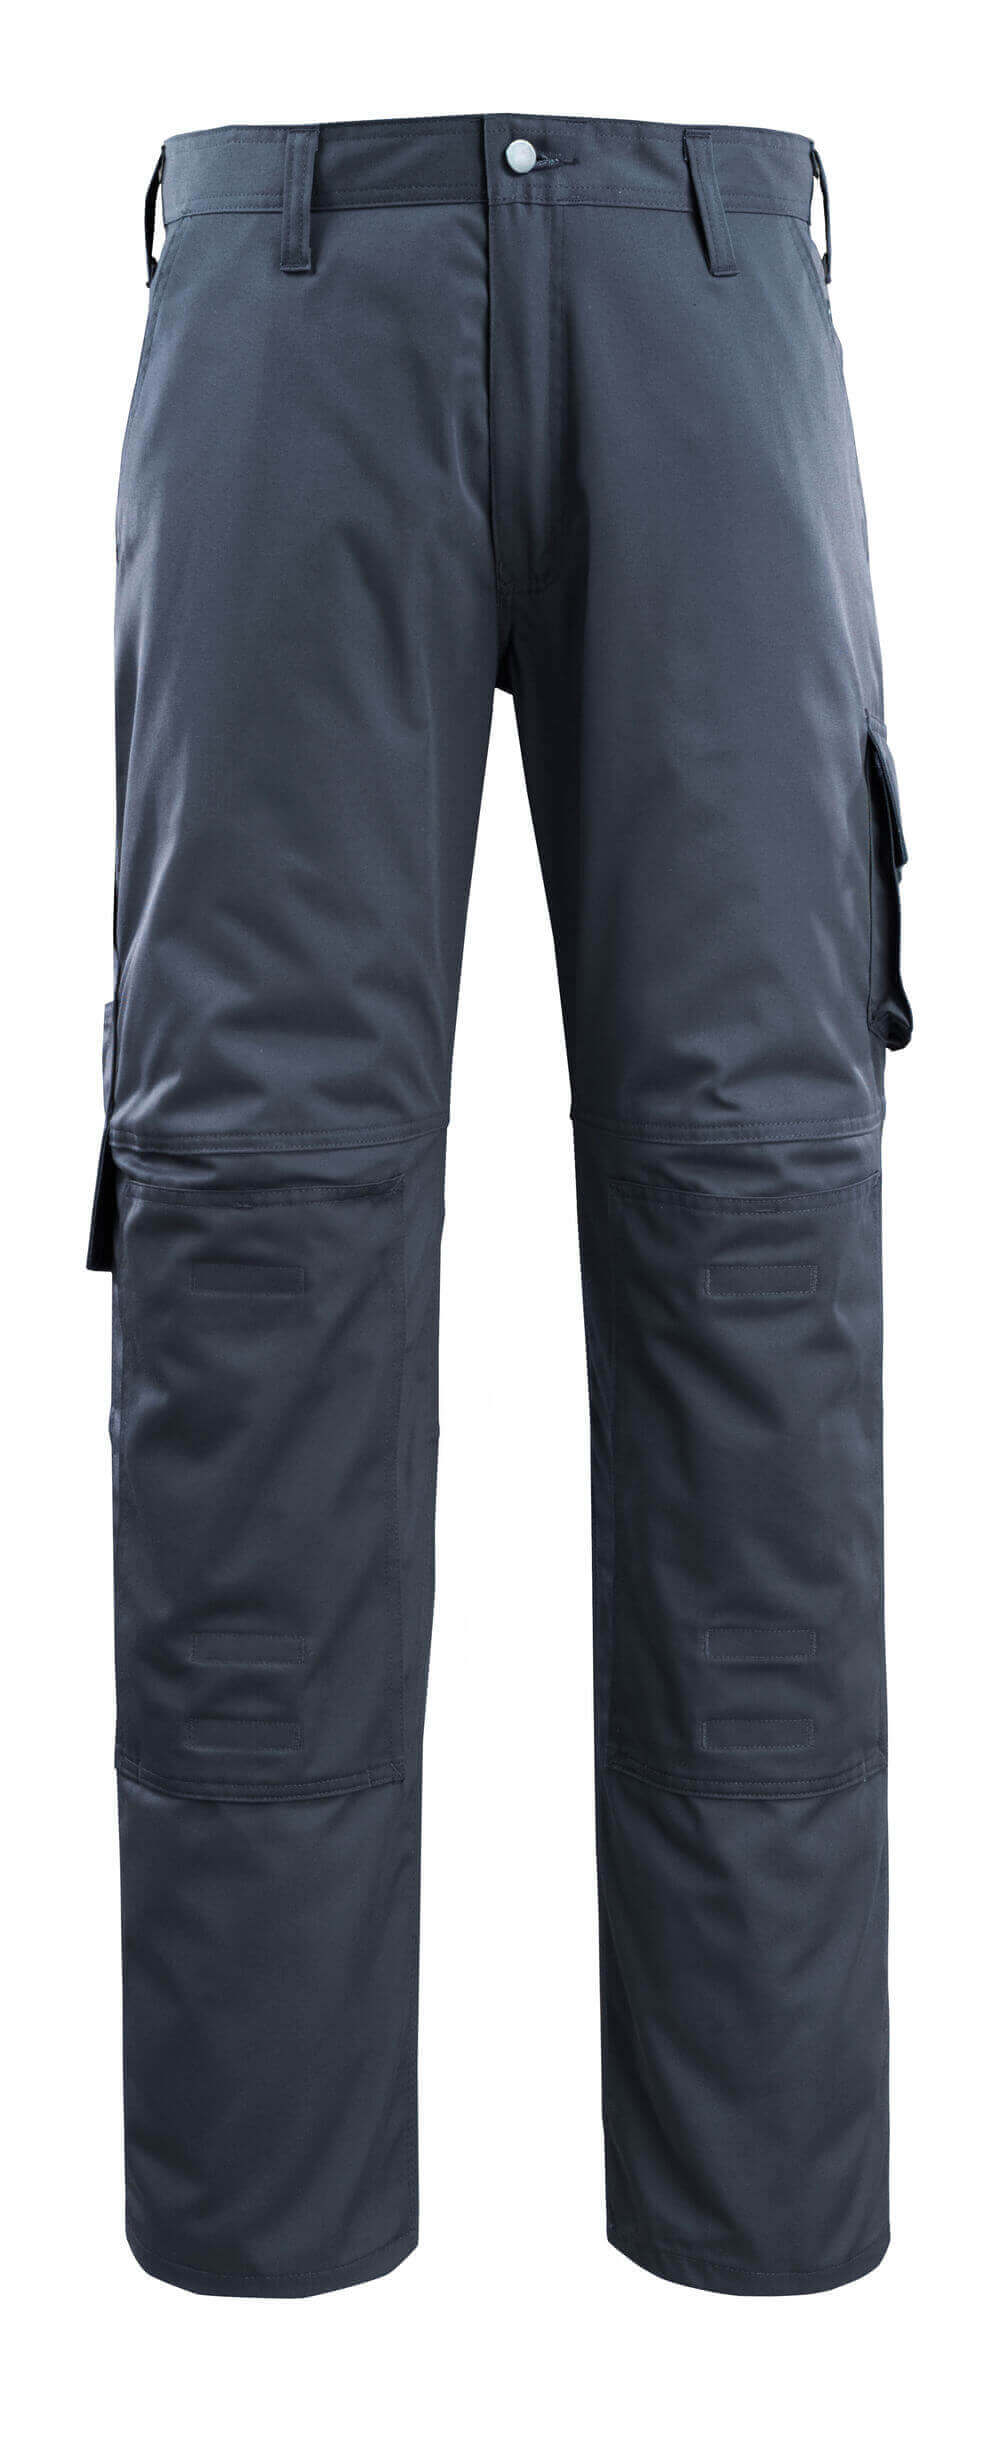 14379-850-010 Spodnie z kieszeniami na kolanach - ciemny granat